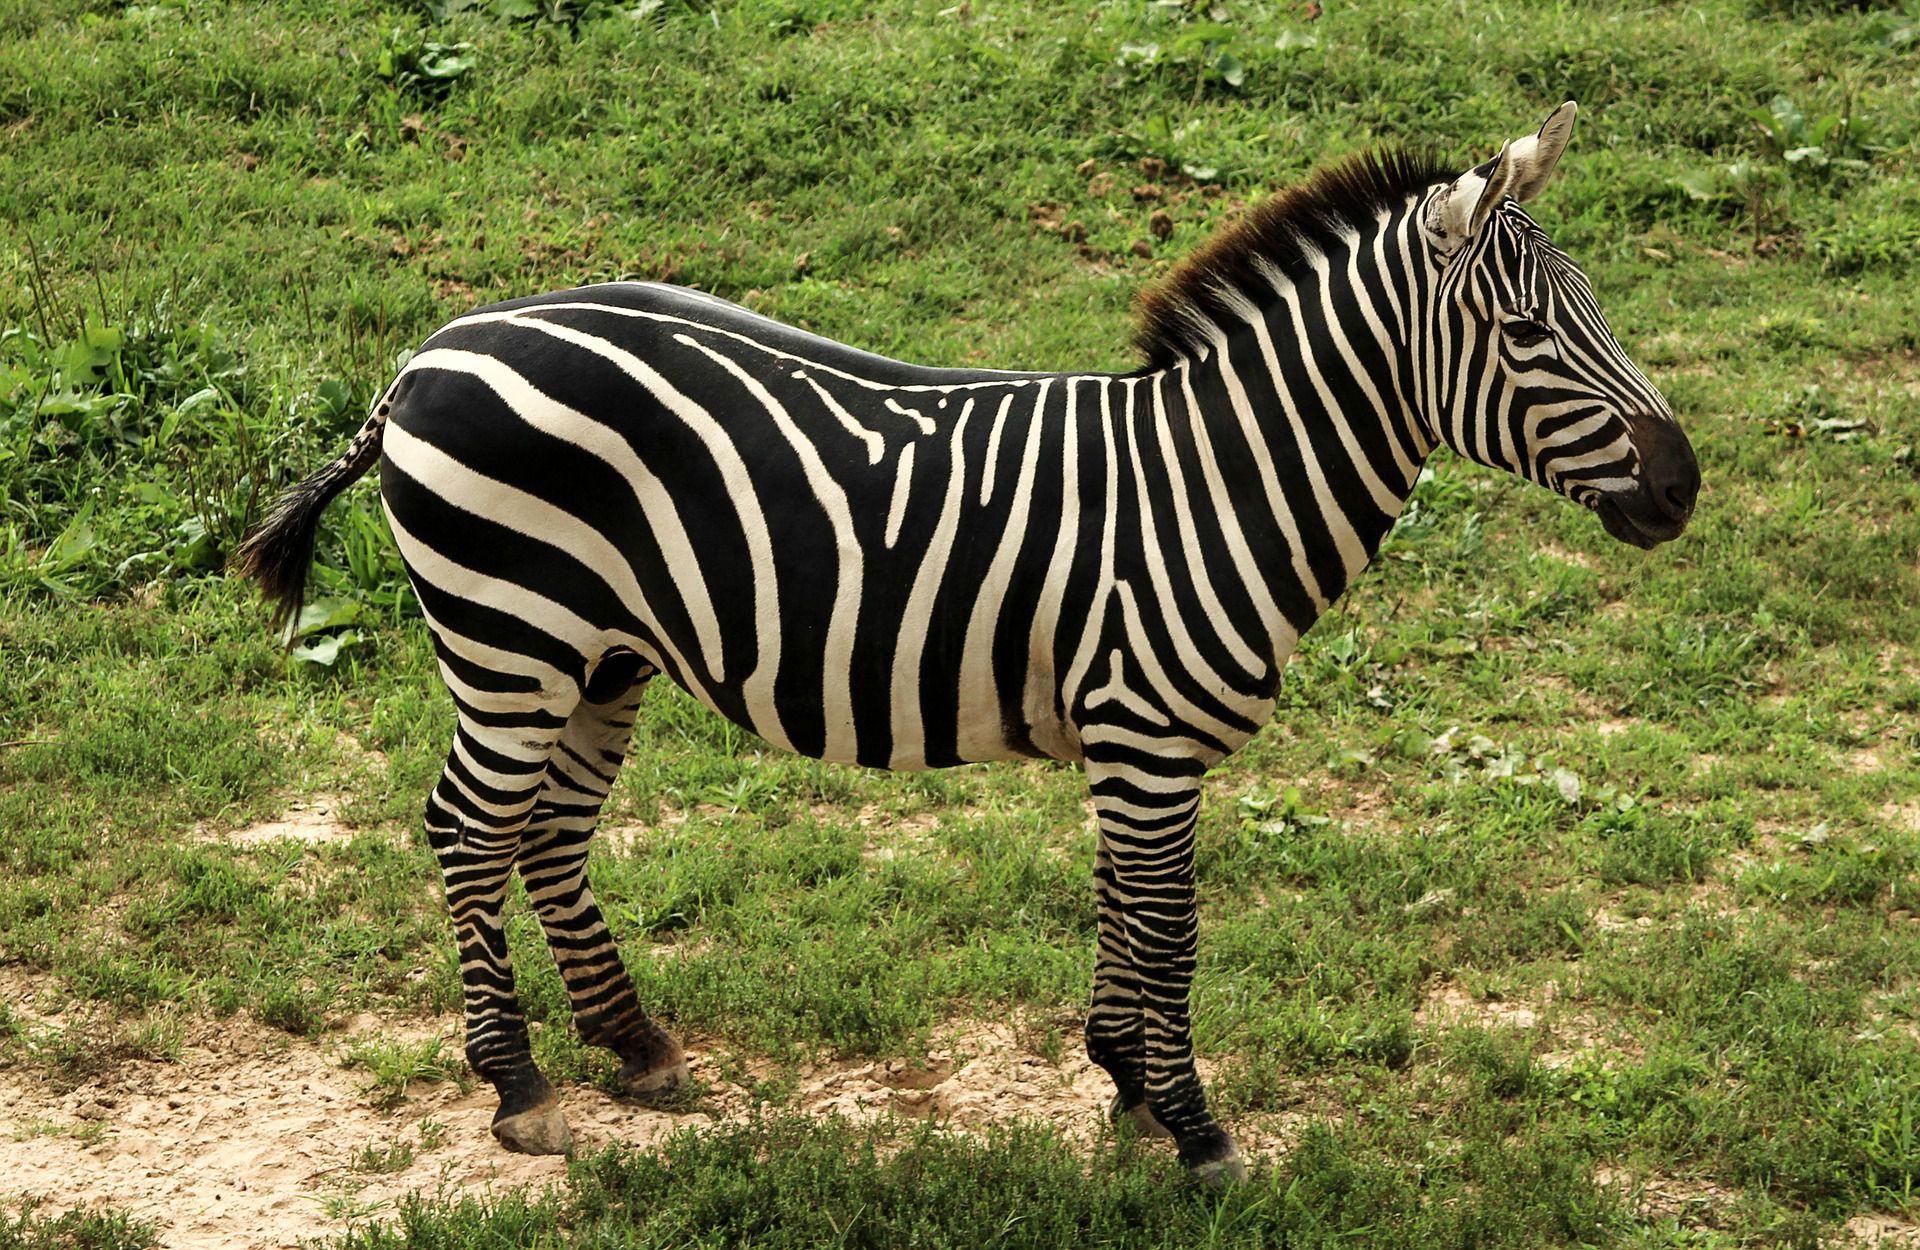 Zebra standing in the grass in profile.